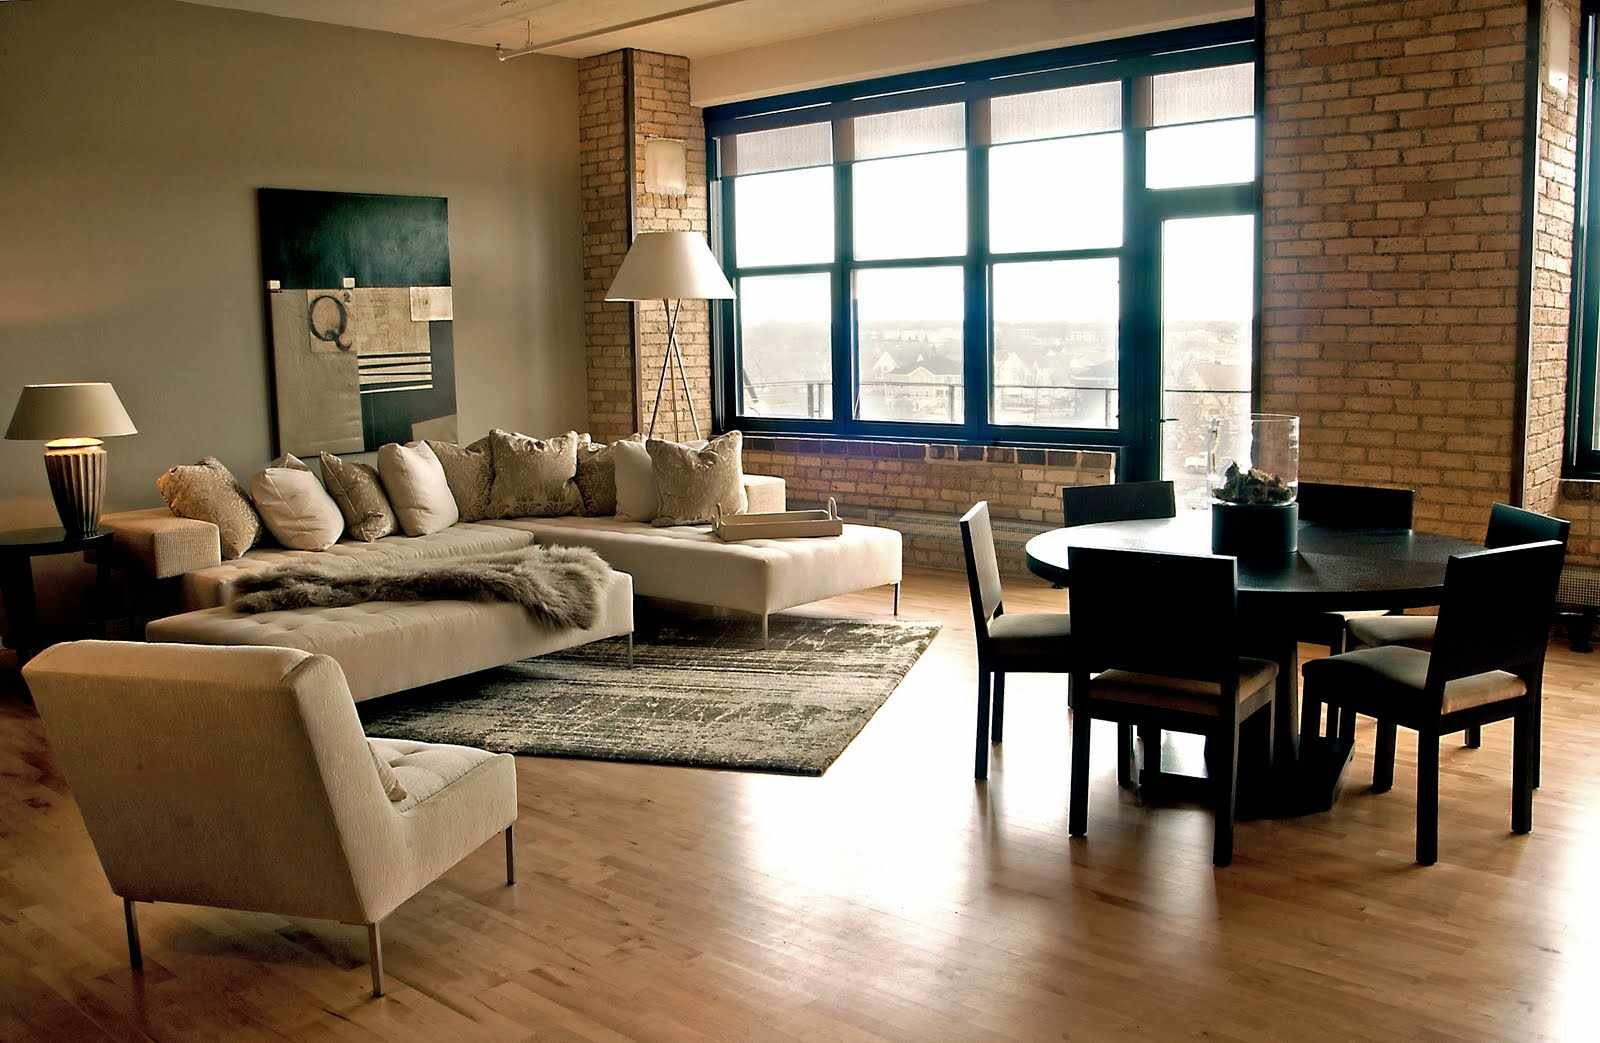 Ламинат на полу в гостиной в стиле лофт